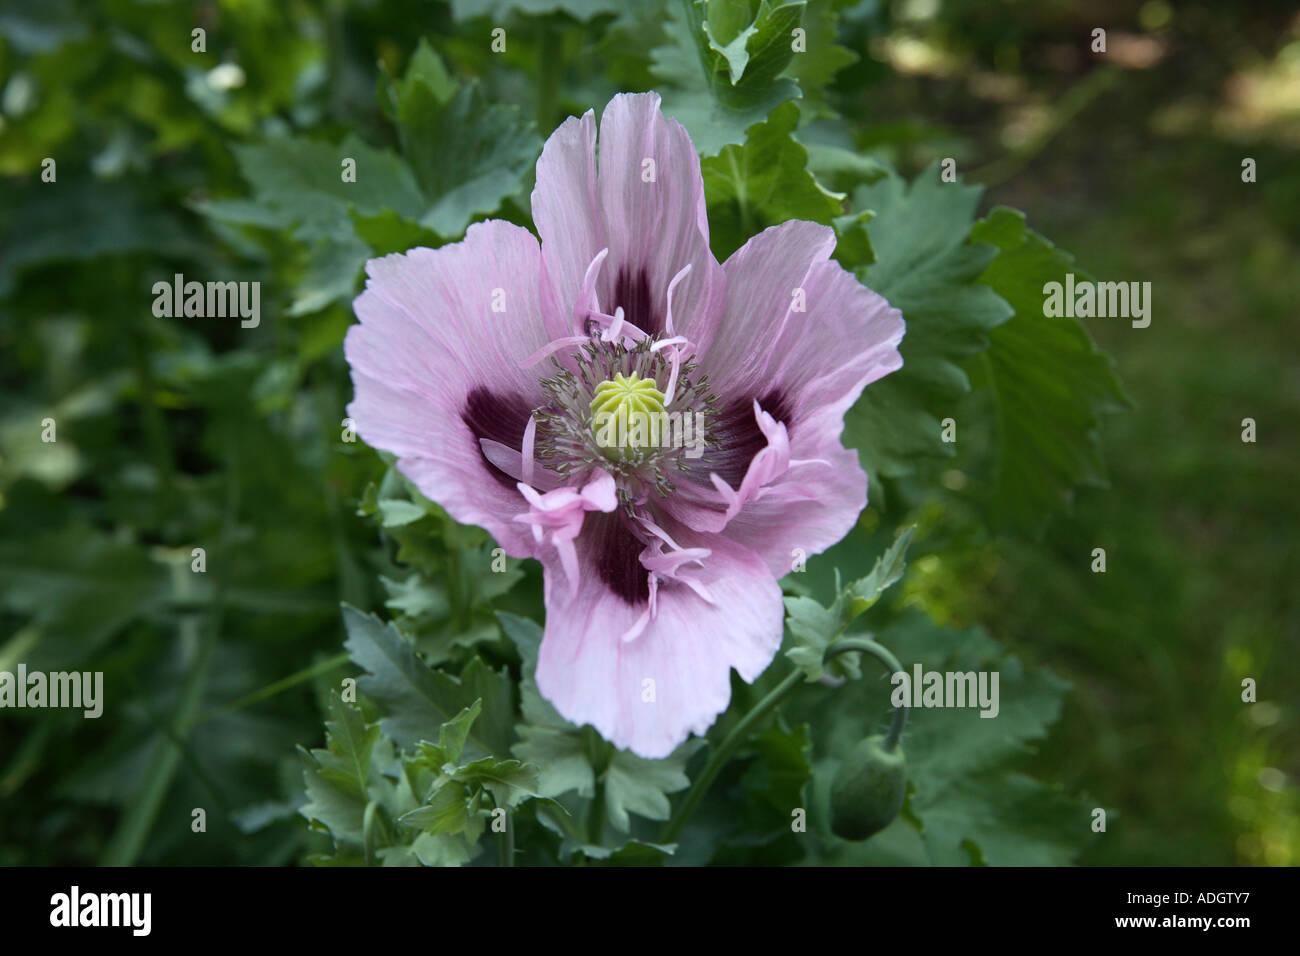 Purple Large Opium Poppies Drugs Medicine Plant Heroin Stock Photos